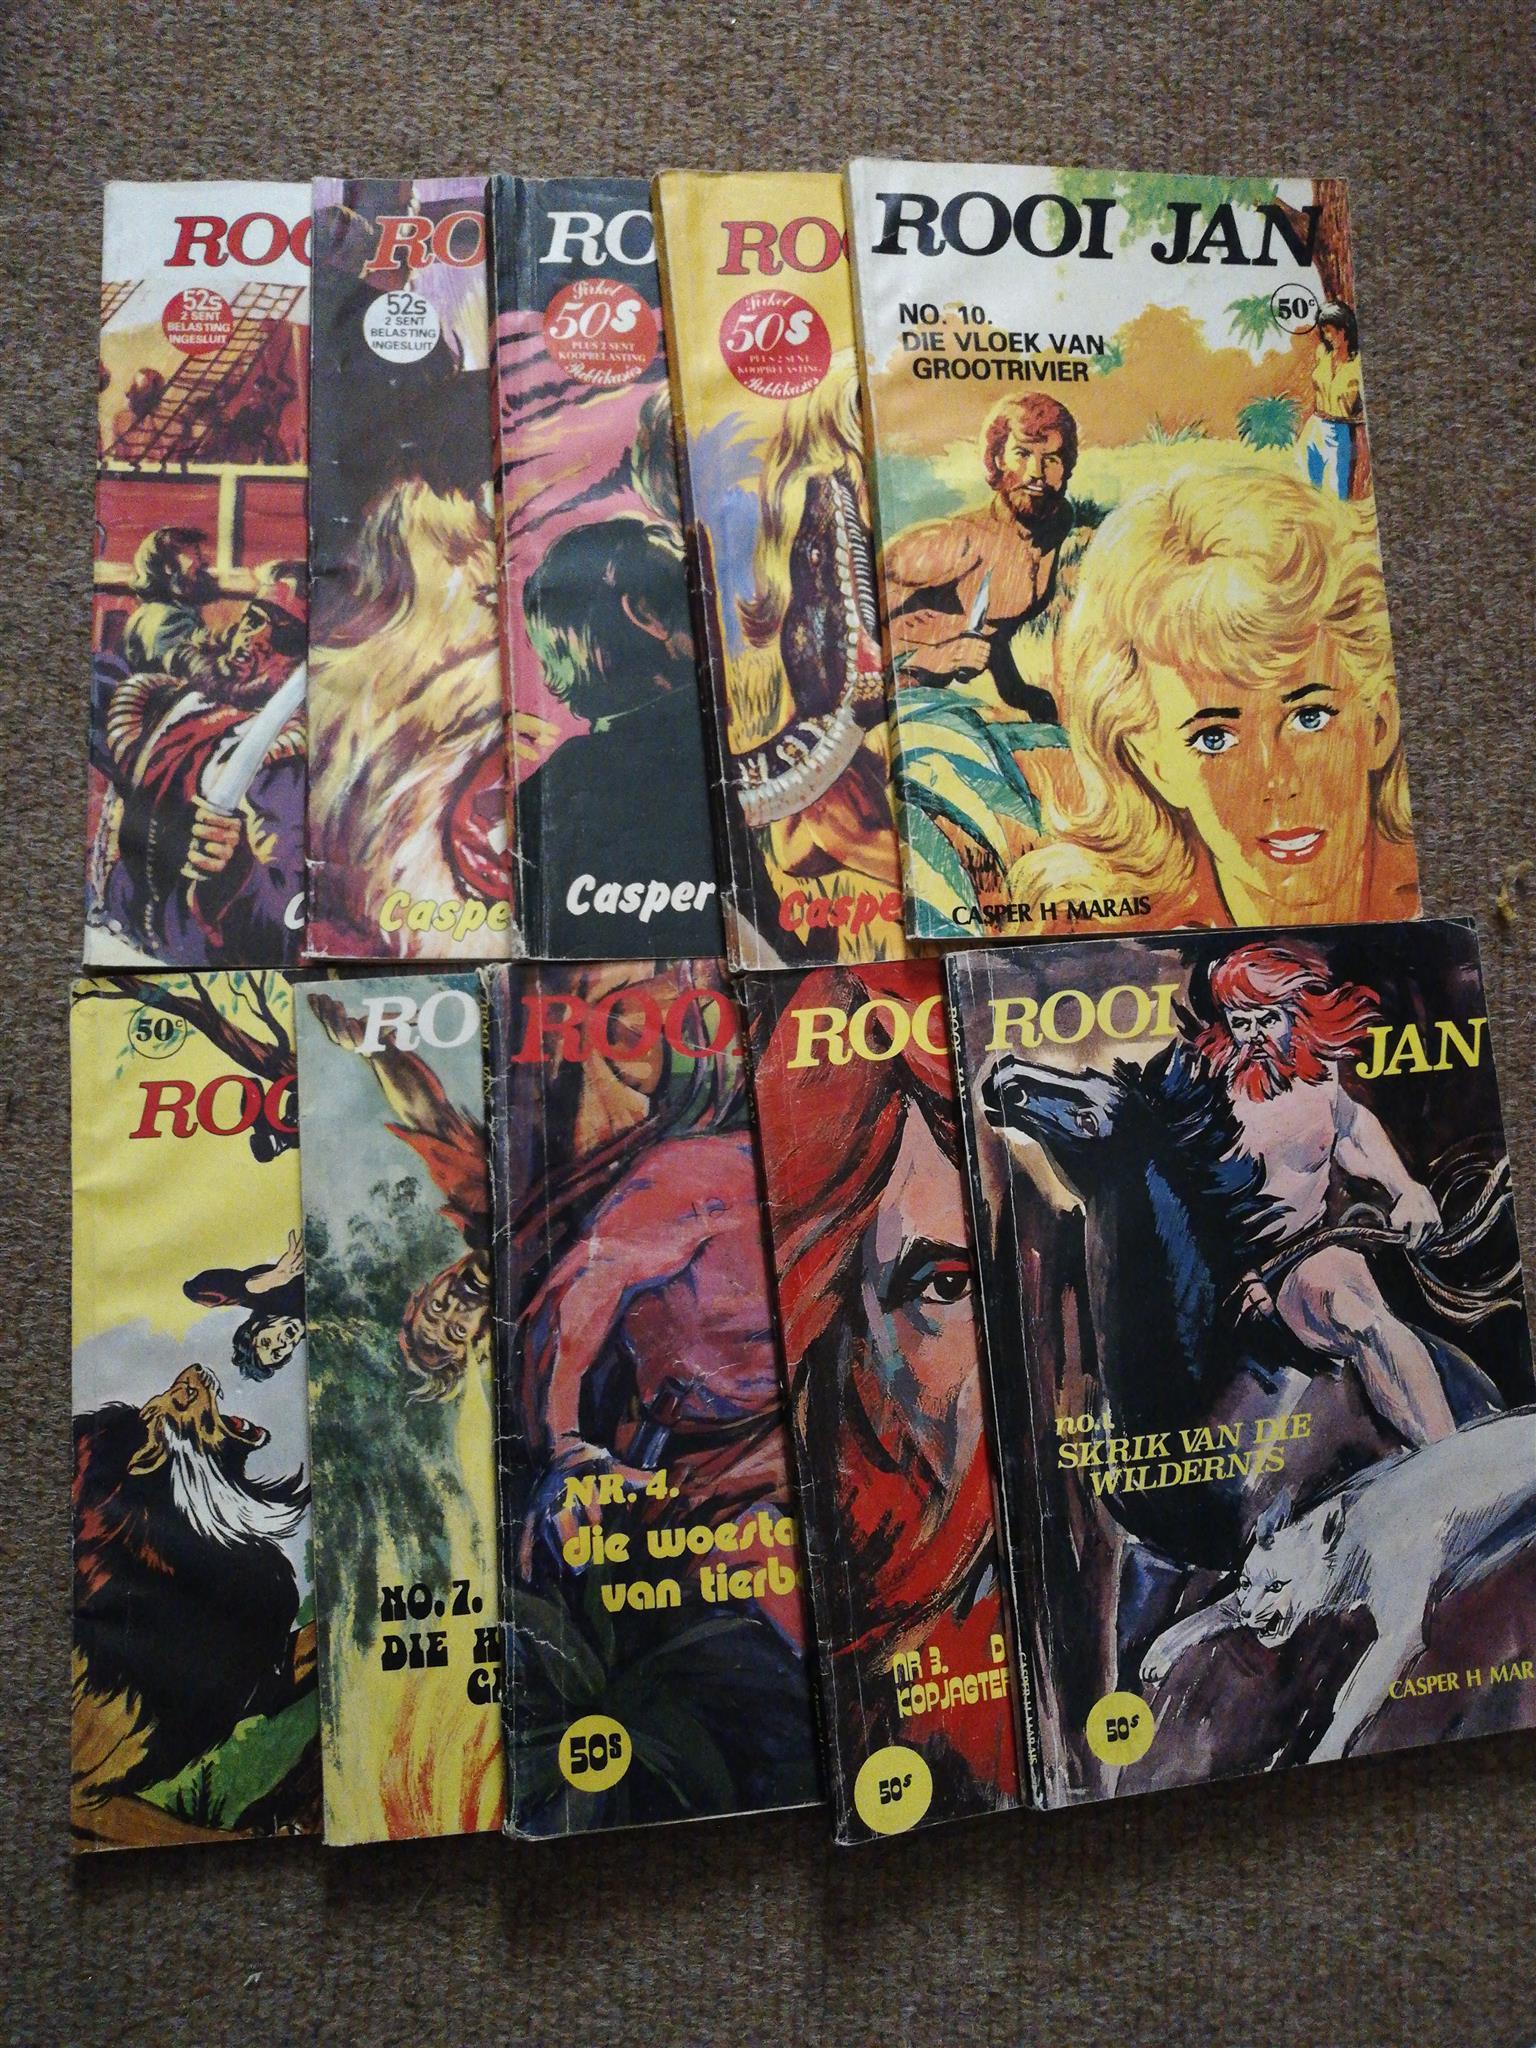 Rooi Jan books